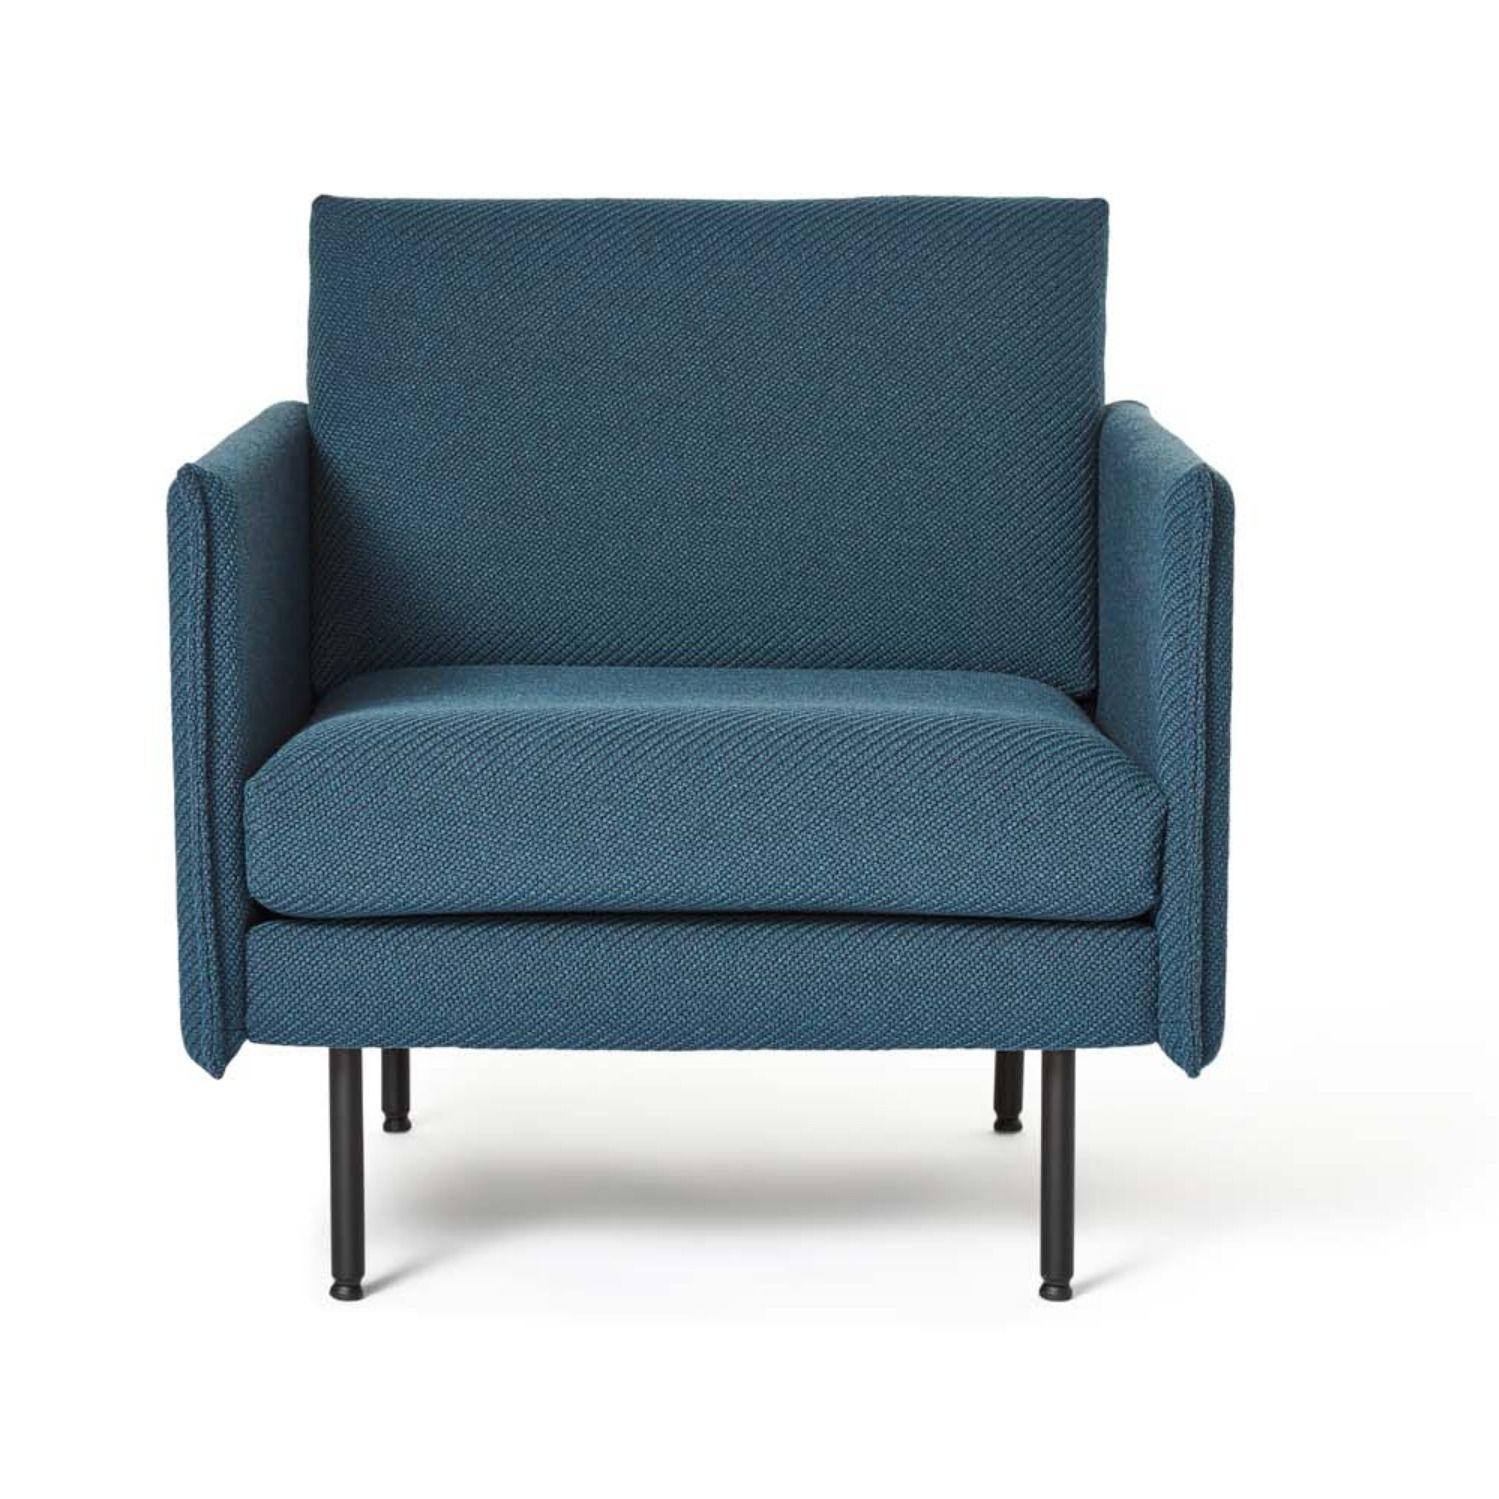 Form 1 Seater Lounge Chair Workspace Design Danish Furniture